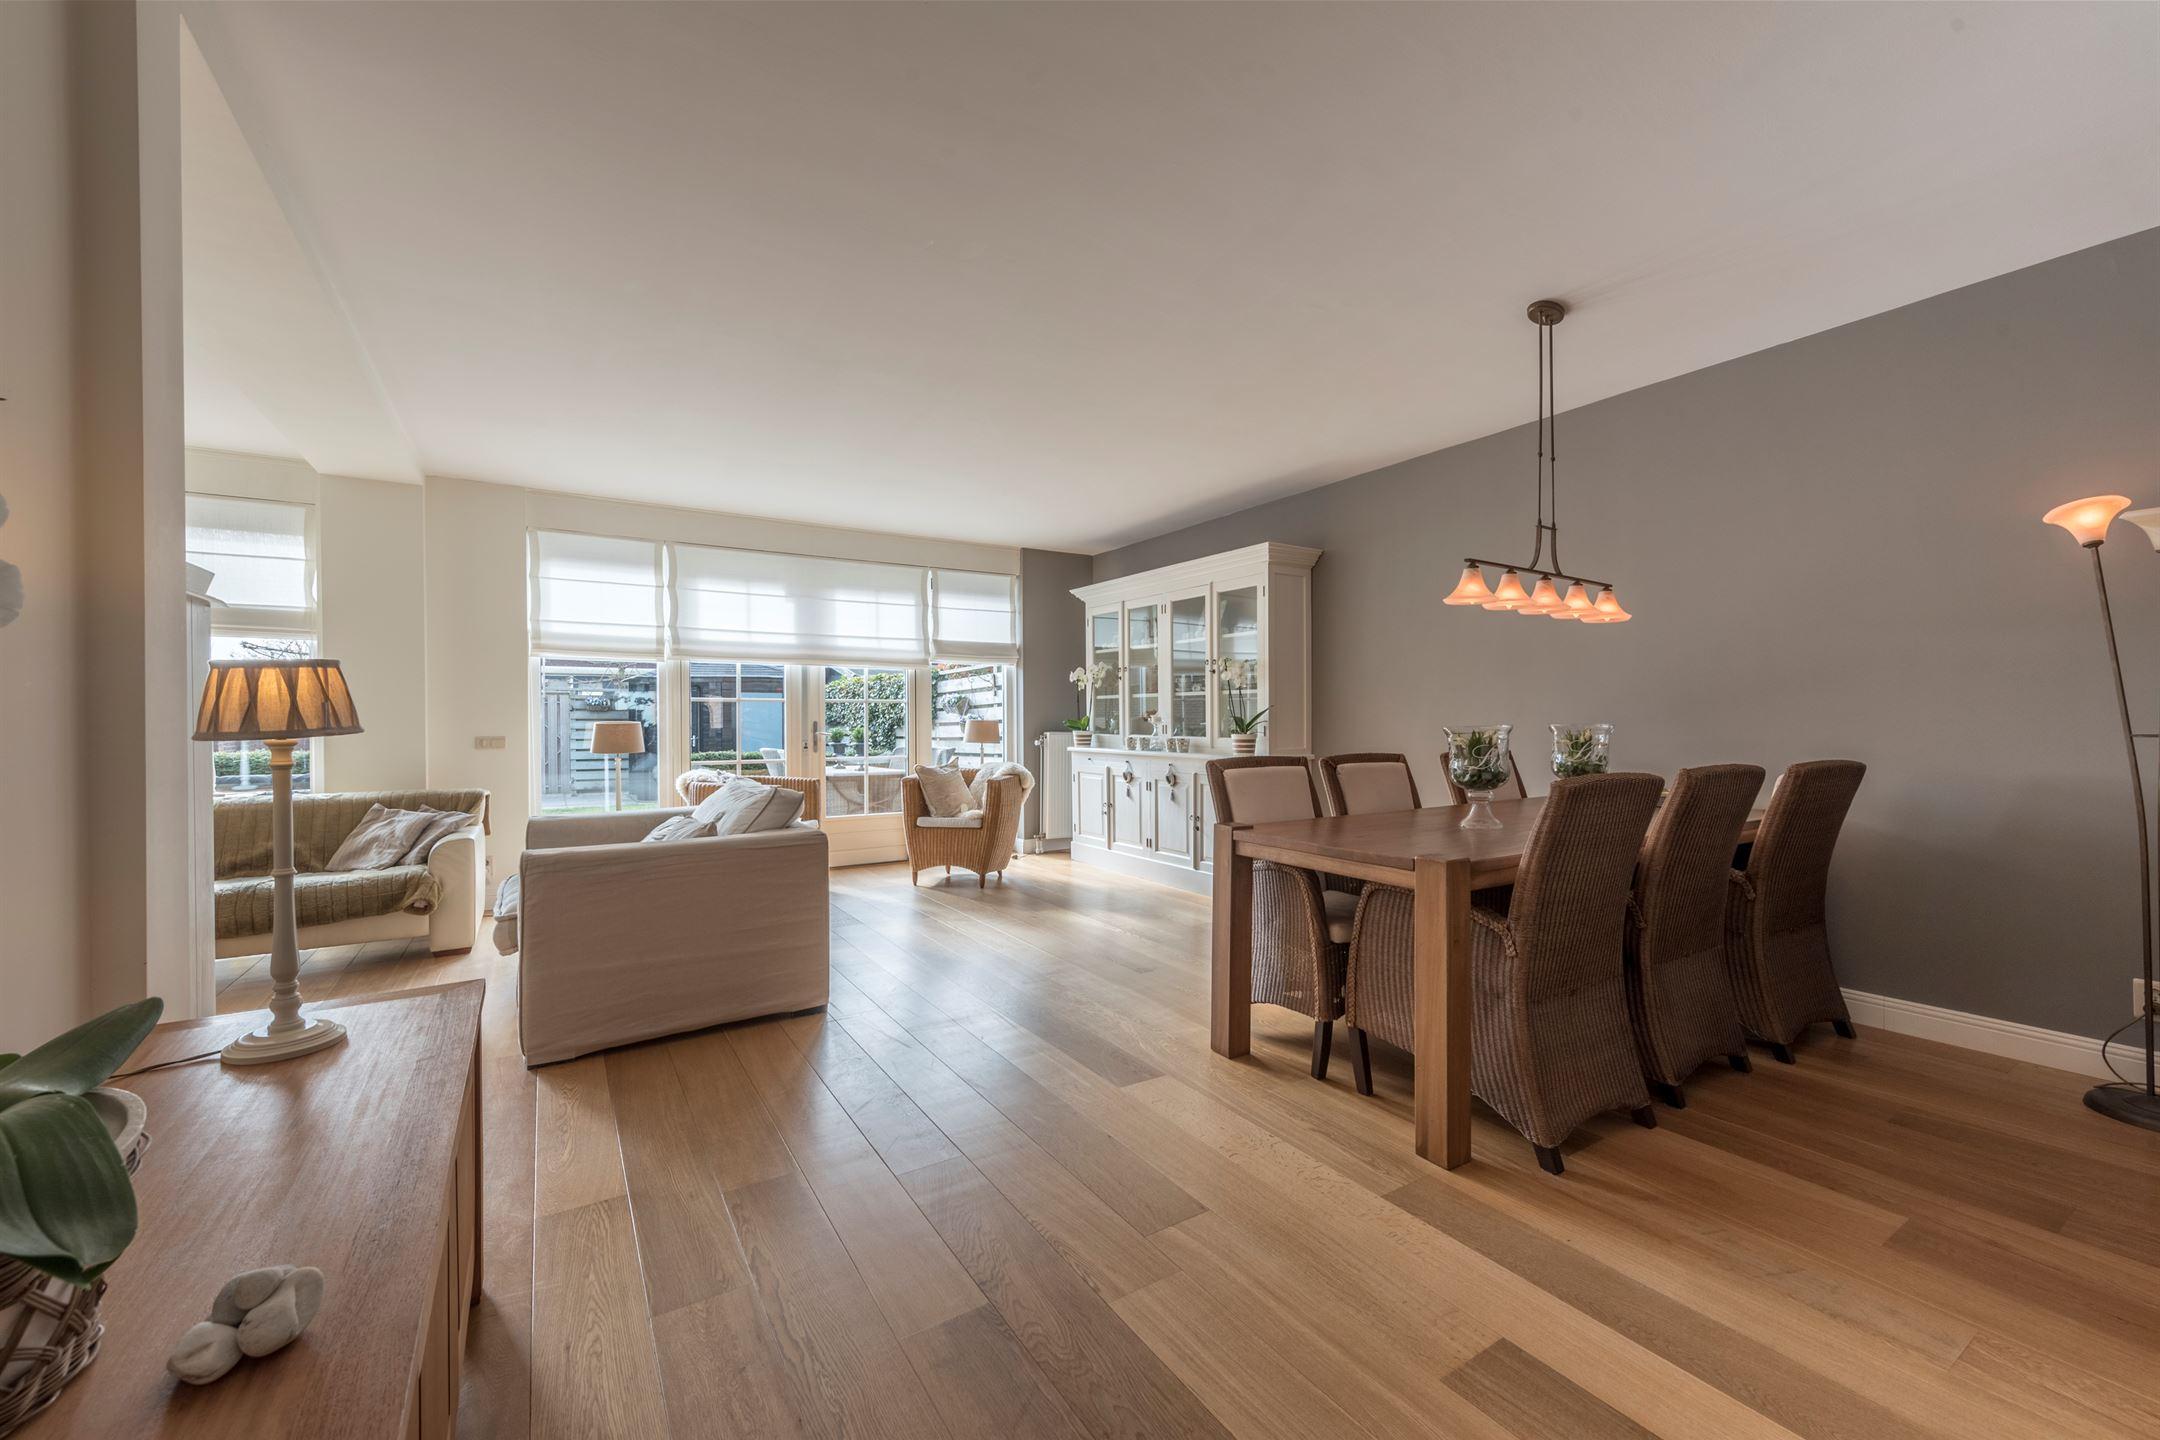 Gele Keuken 6 : Moderne bruin witte keuken deze moderne keuken bewijst dat je